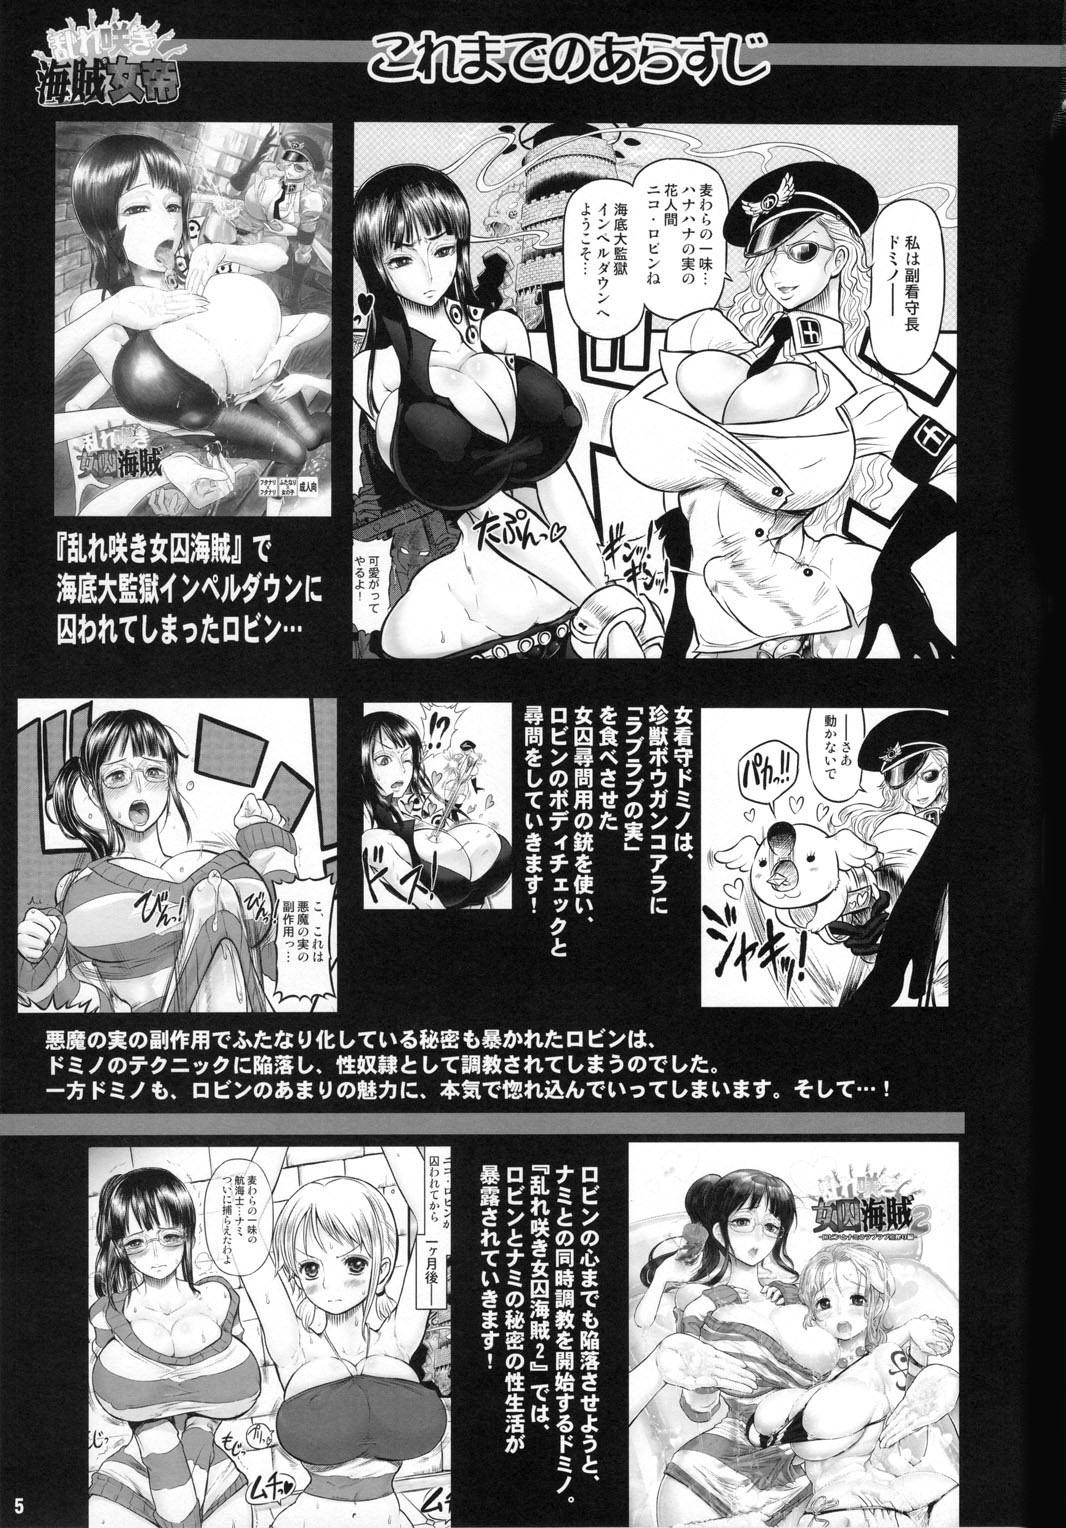 Midarezaki Kaizoku Jotei | Bloom Pirate Hooker Queen 3